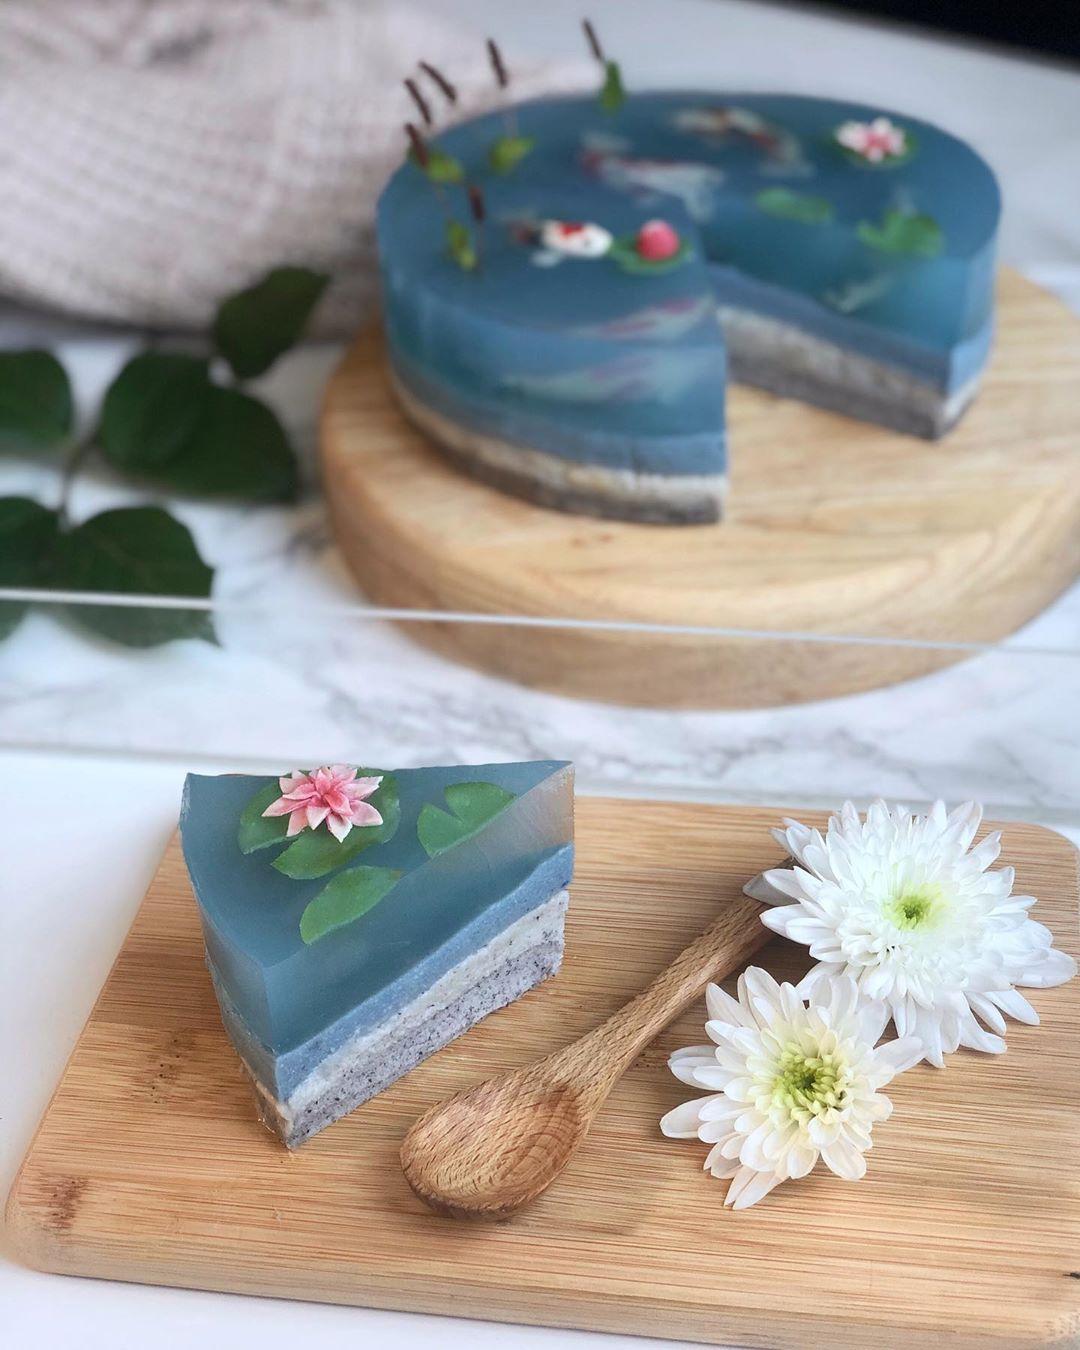 transparentne ciasto jeziorko 3